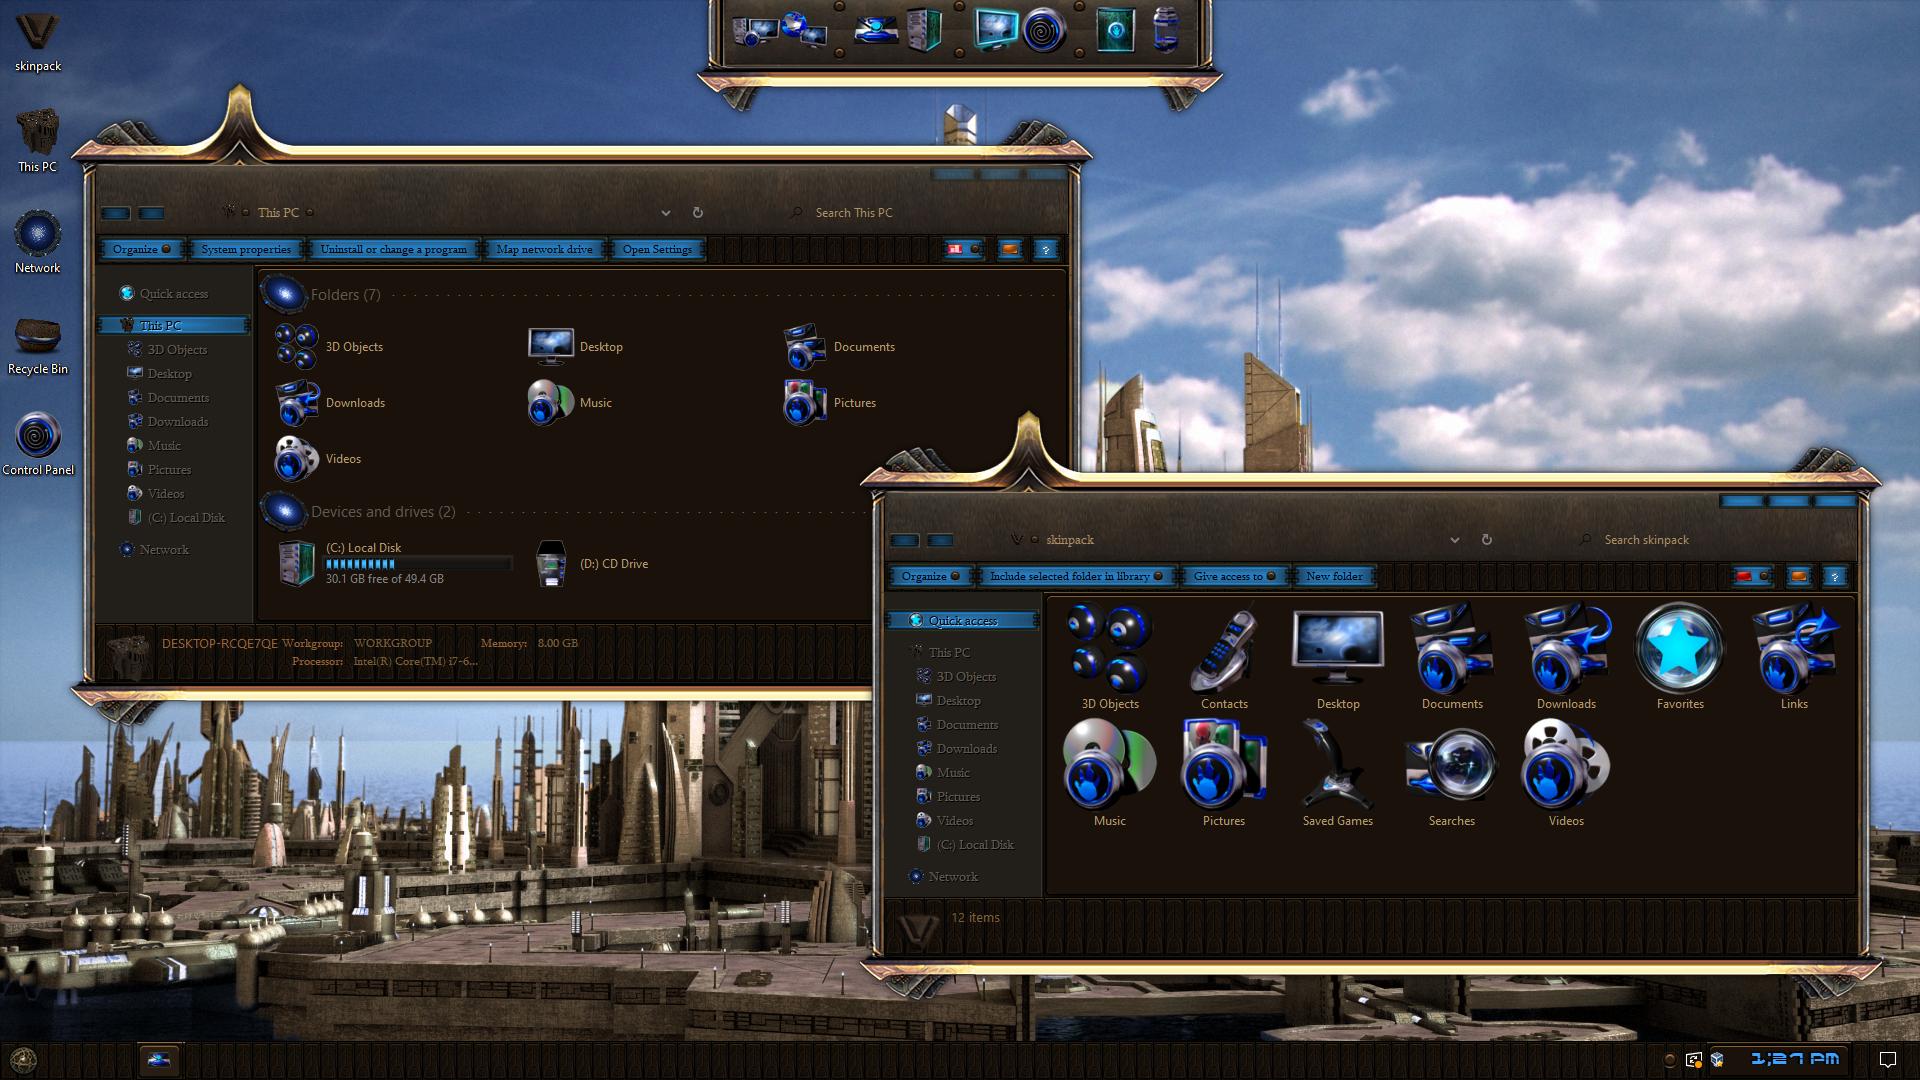 STARGATE ATLANTIS Premium SkinPack for Windows 10